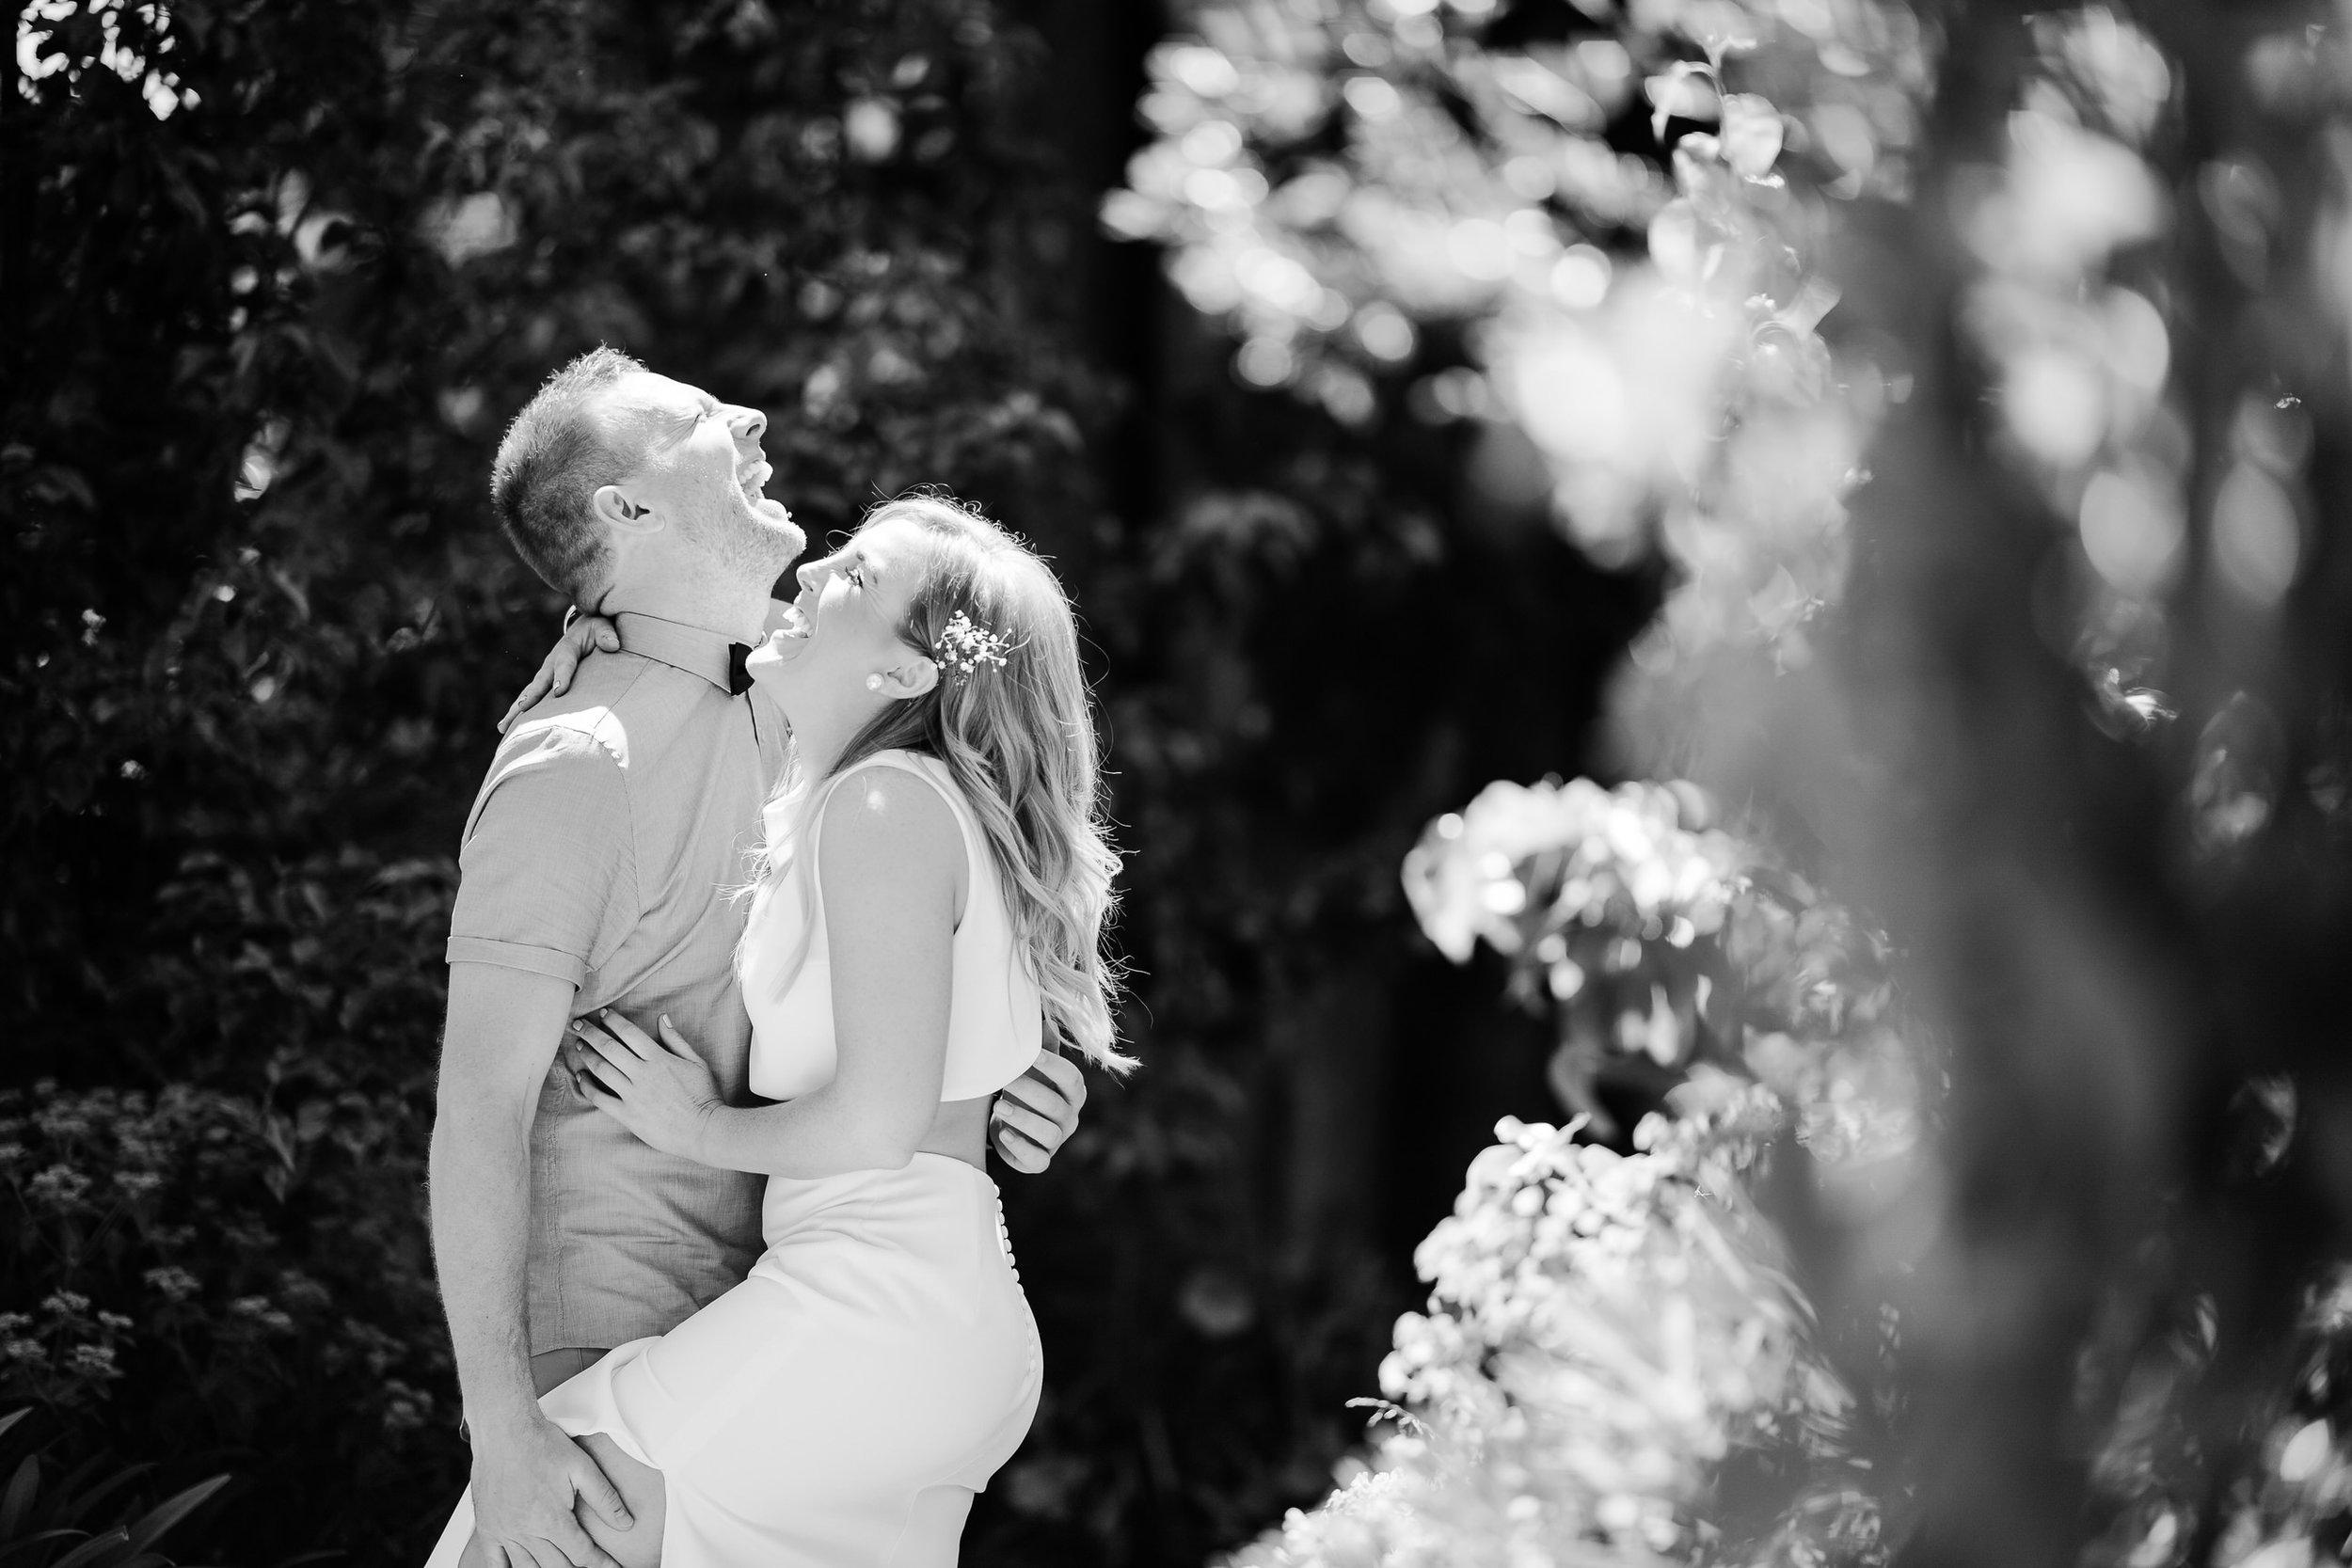 Bendigo_Wedding_Photography_Justin_Jim_BelvoirPark-64.JPG